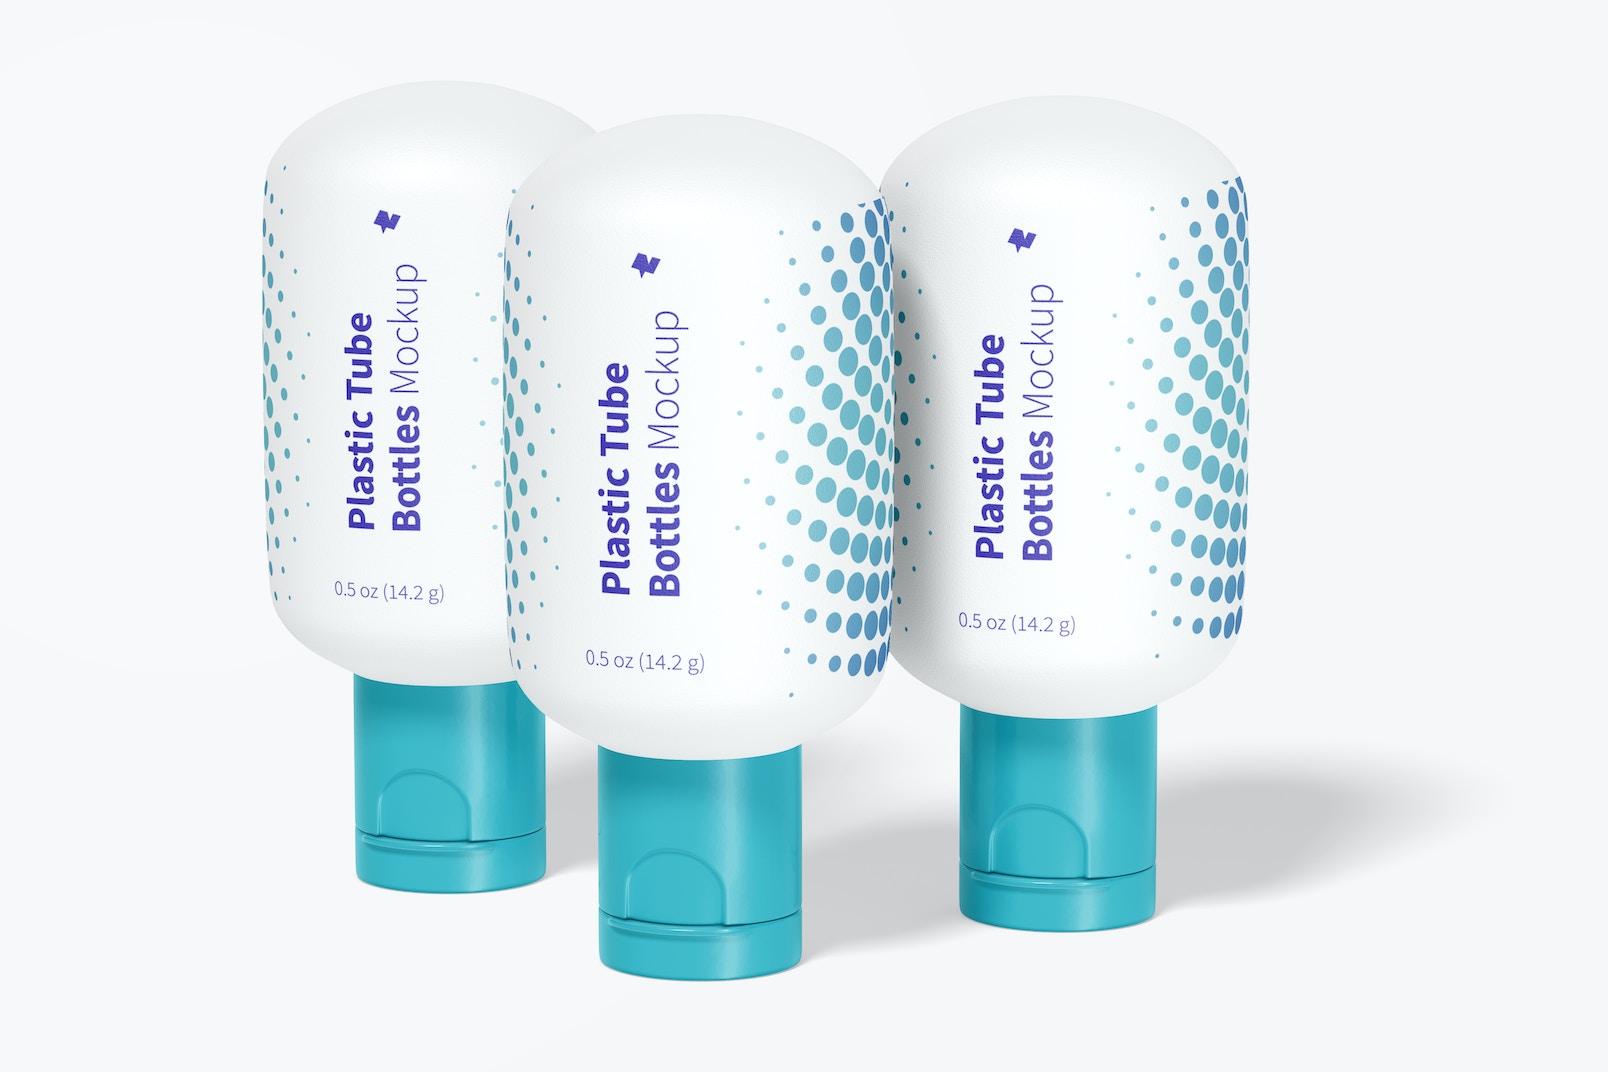 1/2 oz Plastic Tube Bottles Set Mockup